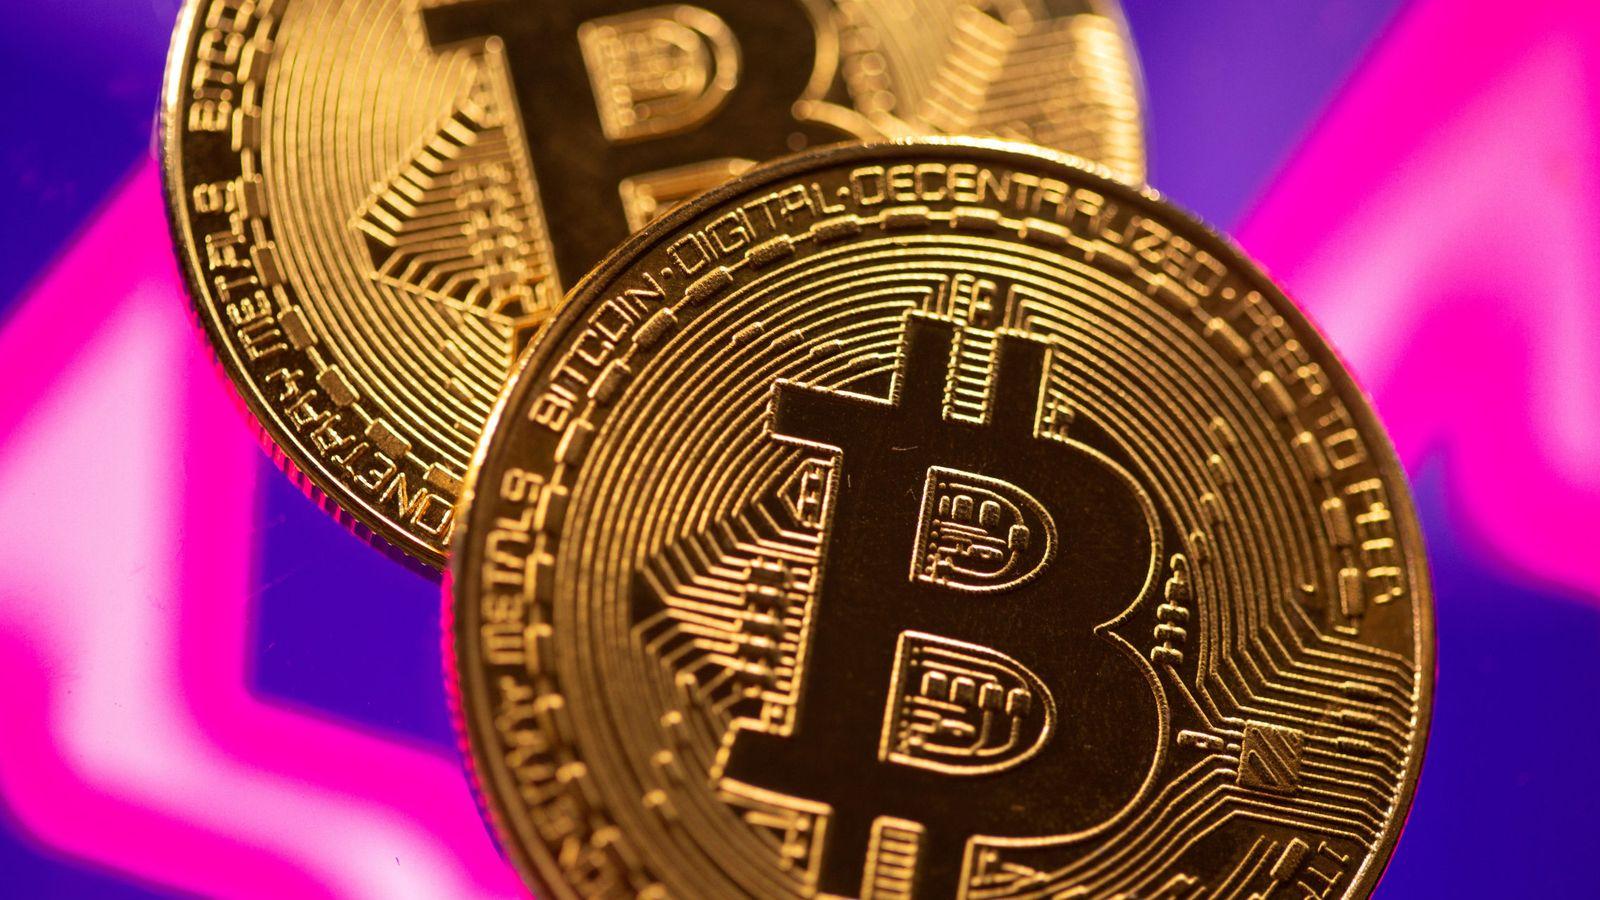 cuanto debería invertir bitcoin núcleo spreads revisão de deve ler antes de negociar com eles